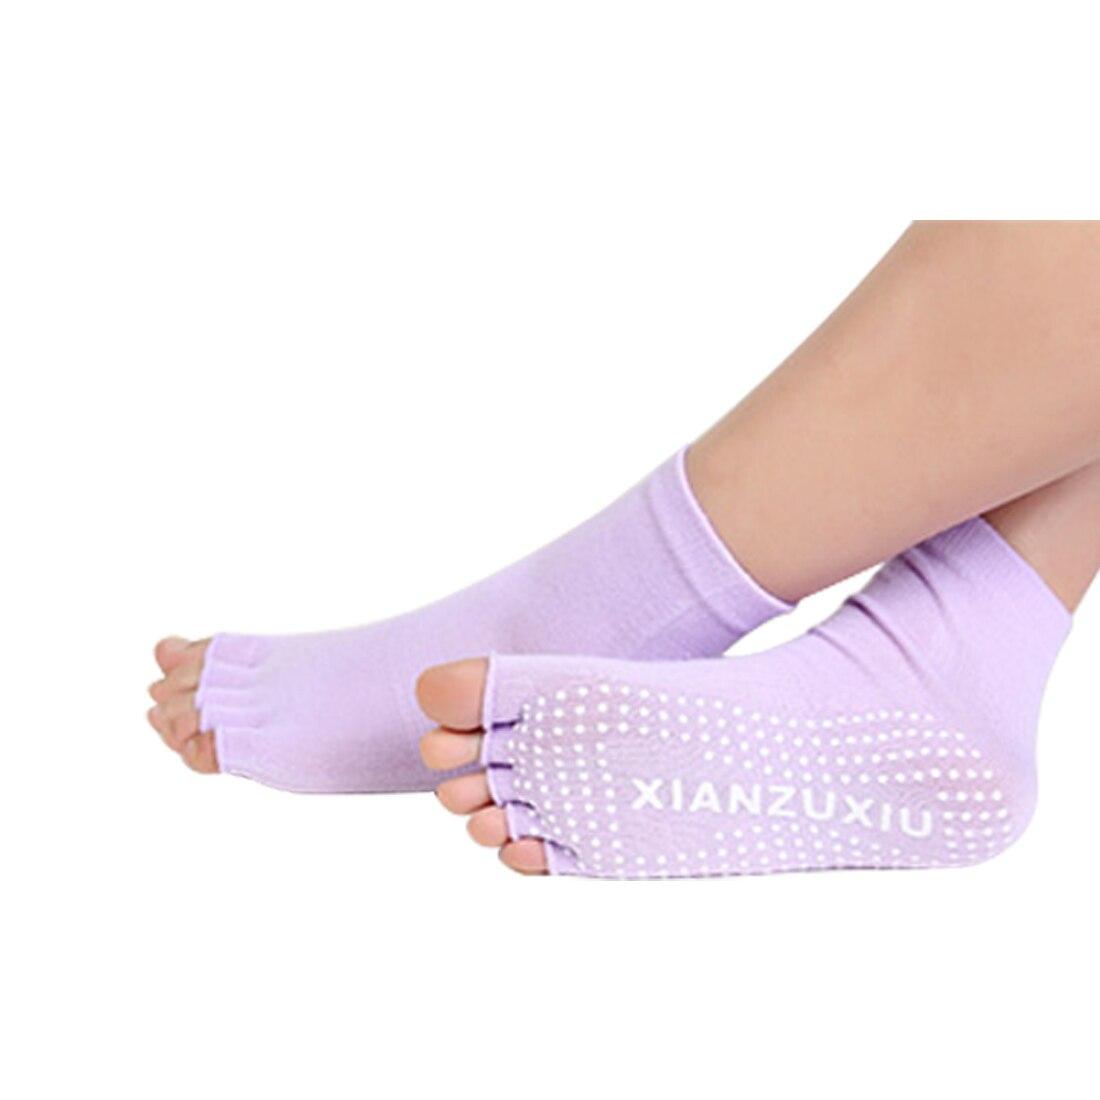 New Half Five Fingers Cotton Half Toe Yoga Sock Non-Slip Peep Toe Anti-Slip Pilates Ankle Grip Durable Open Yoga toe socks